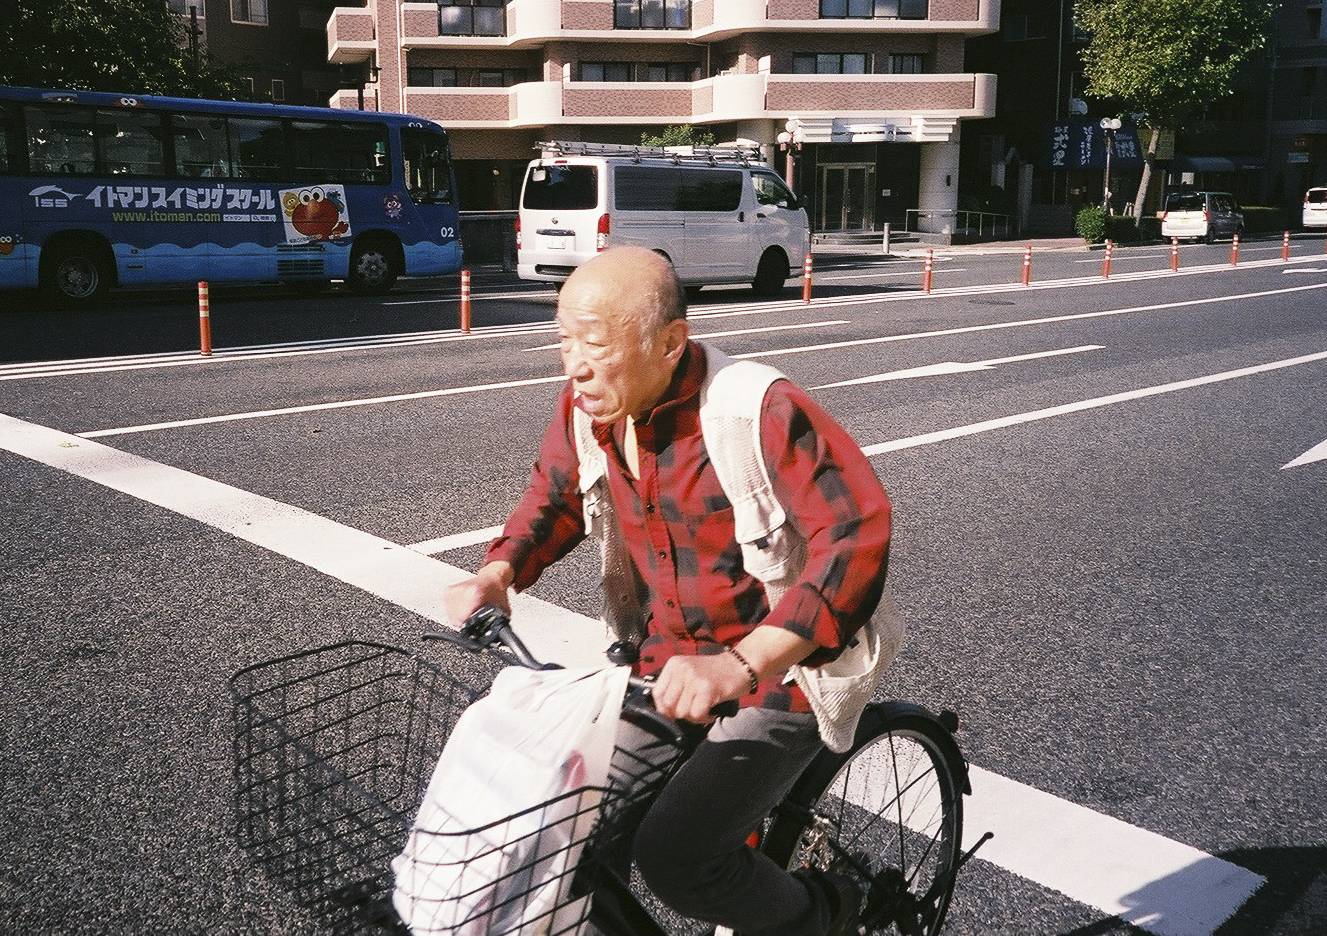 180911_misaki_Osaka_film-86.jpg